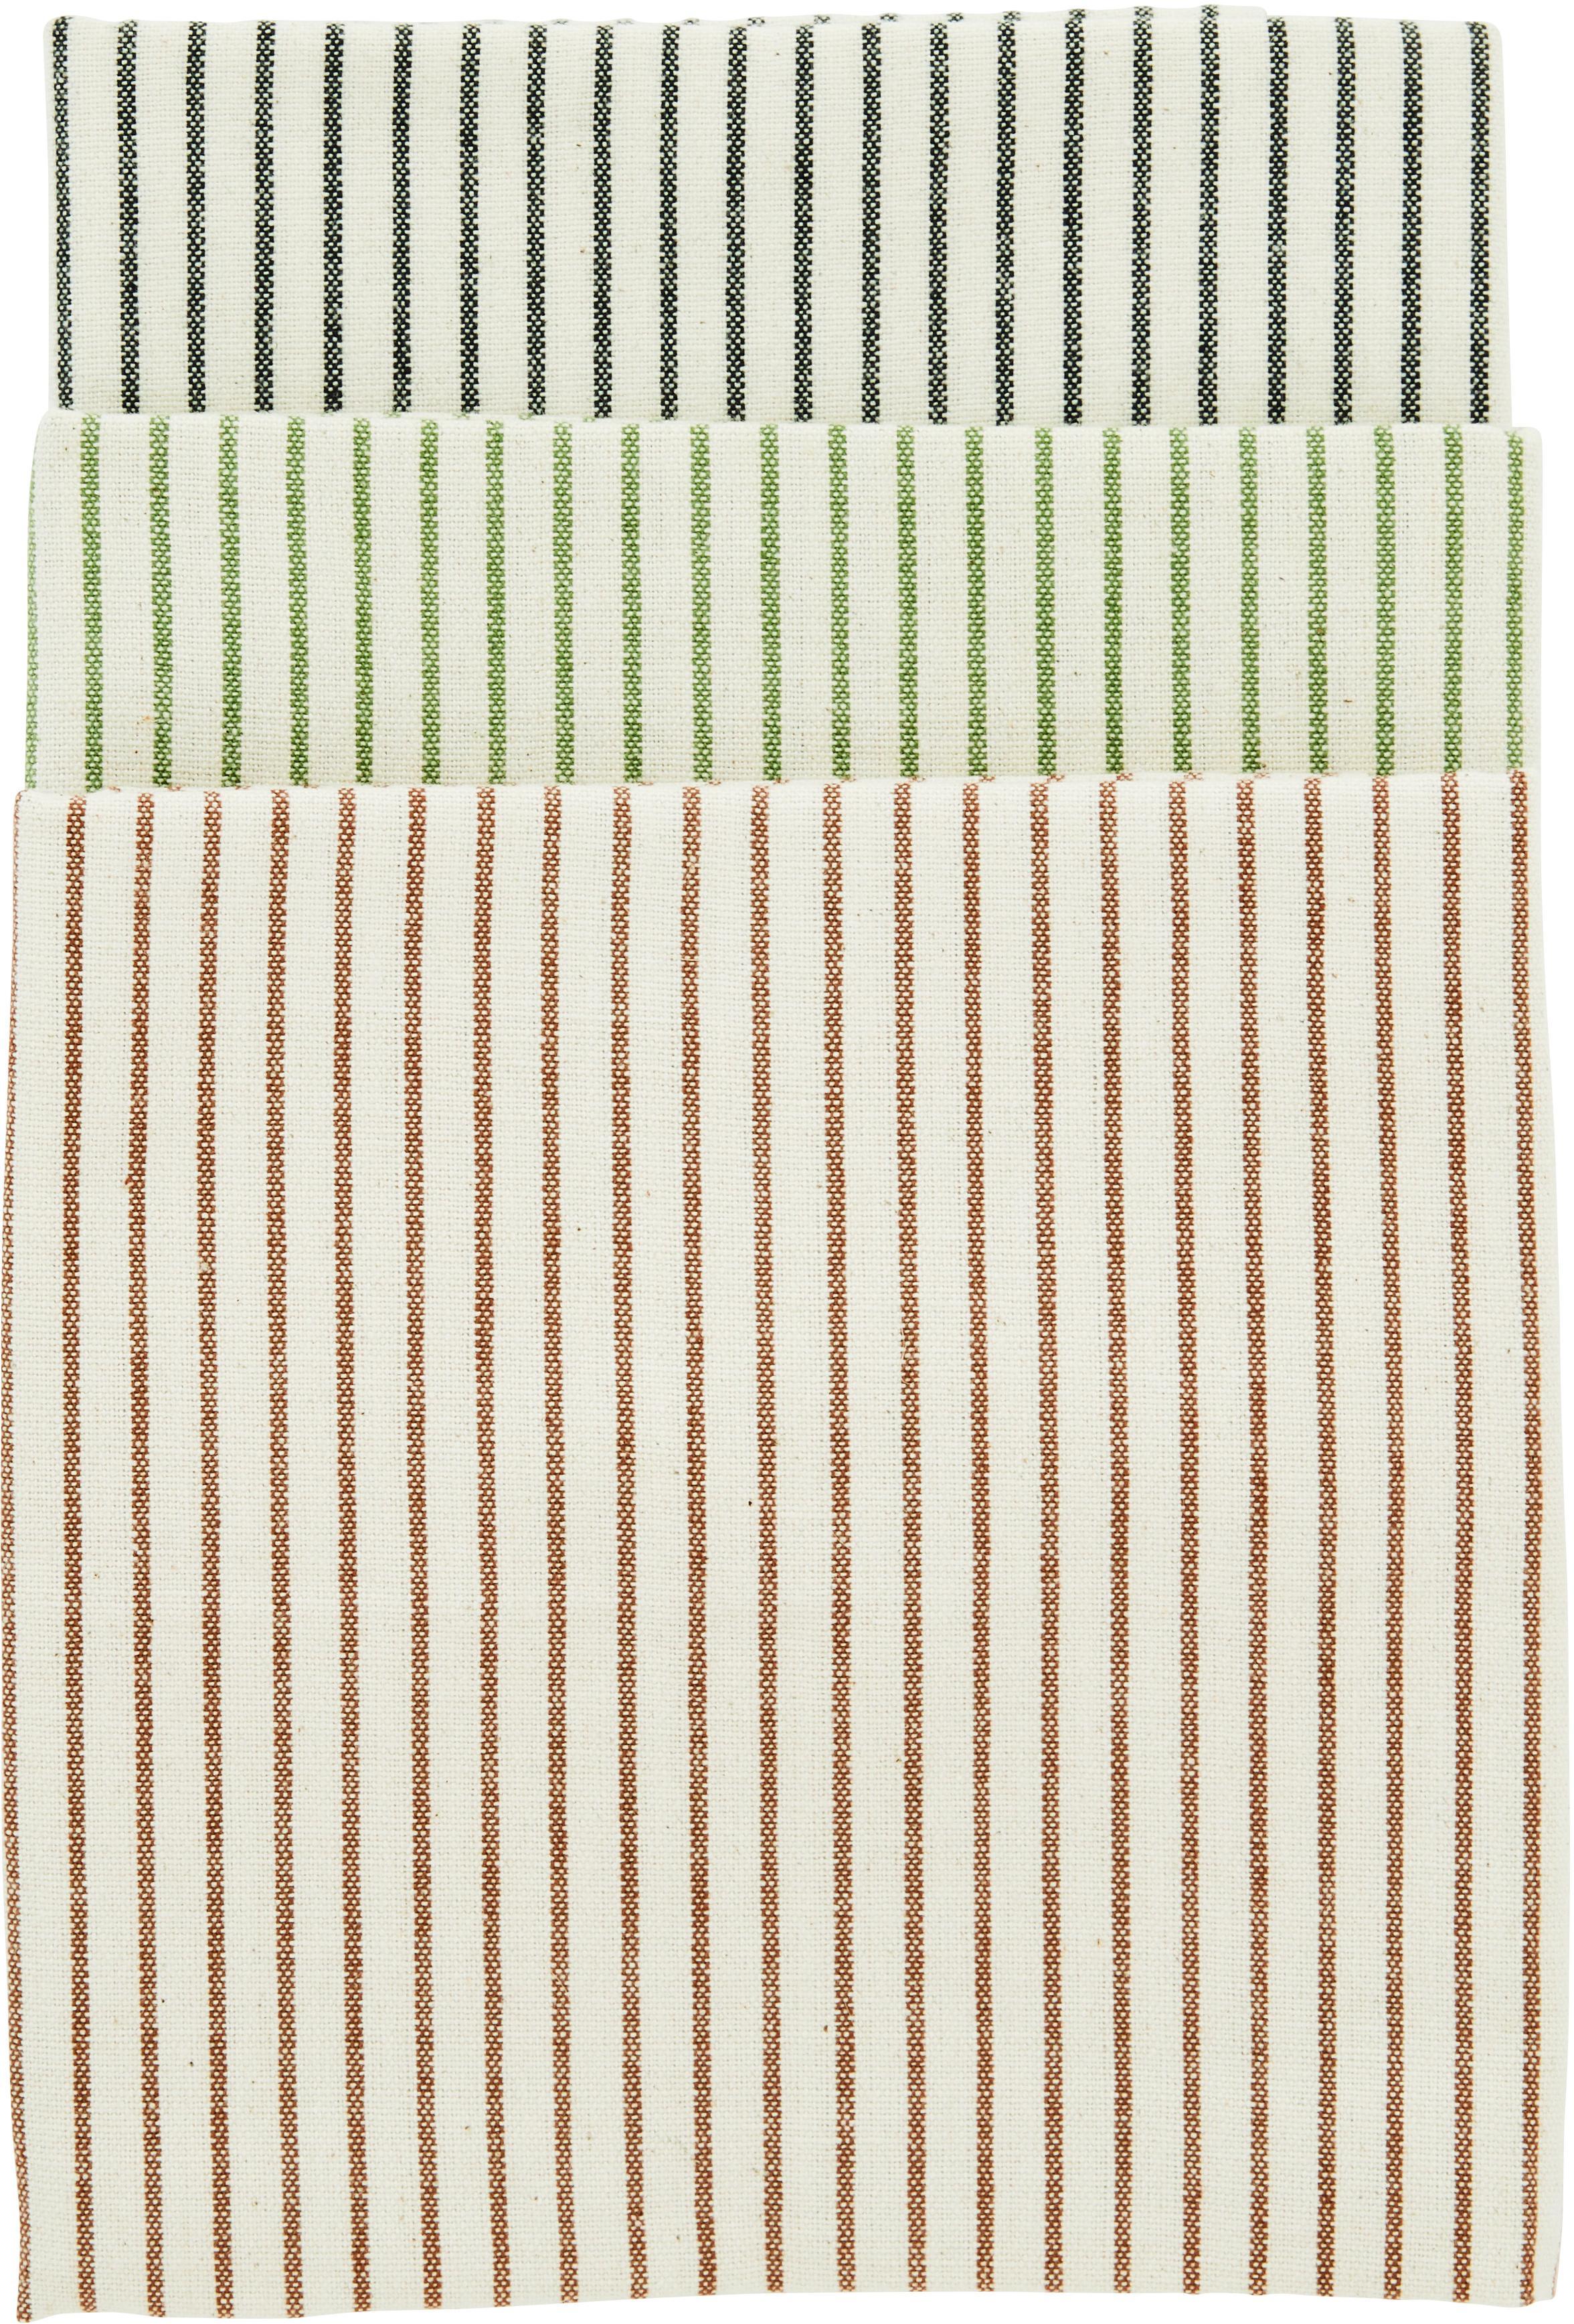 Set 3 strofinacci a strisce Siena, Cotone, Ecru, nero, verde, marrone, Larg. 50 x Lung. 70 cm